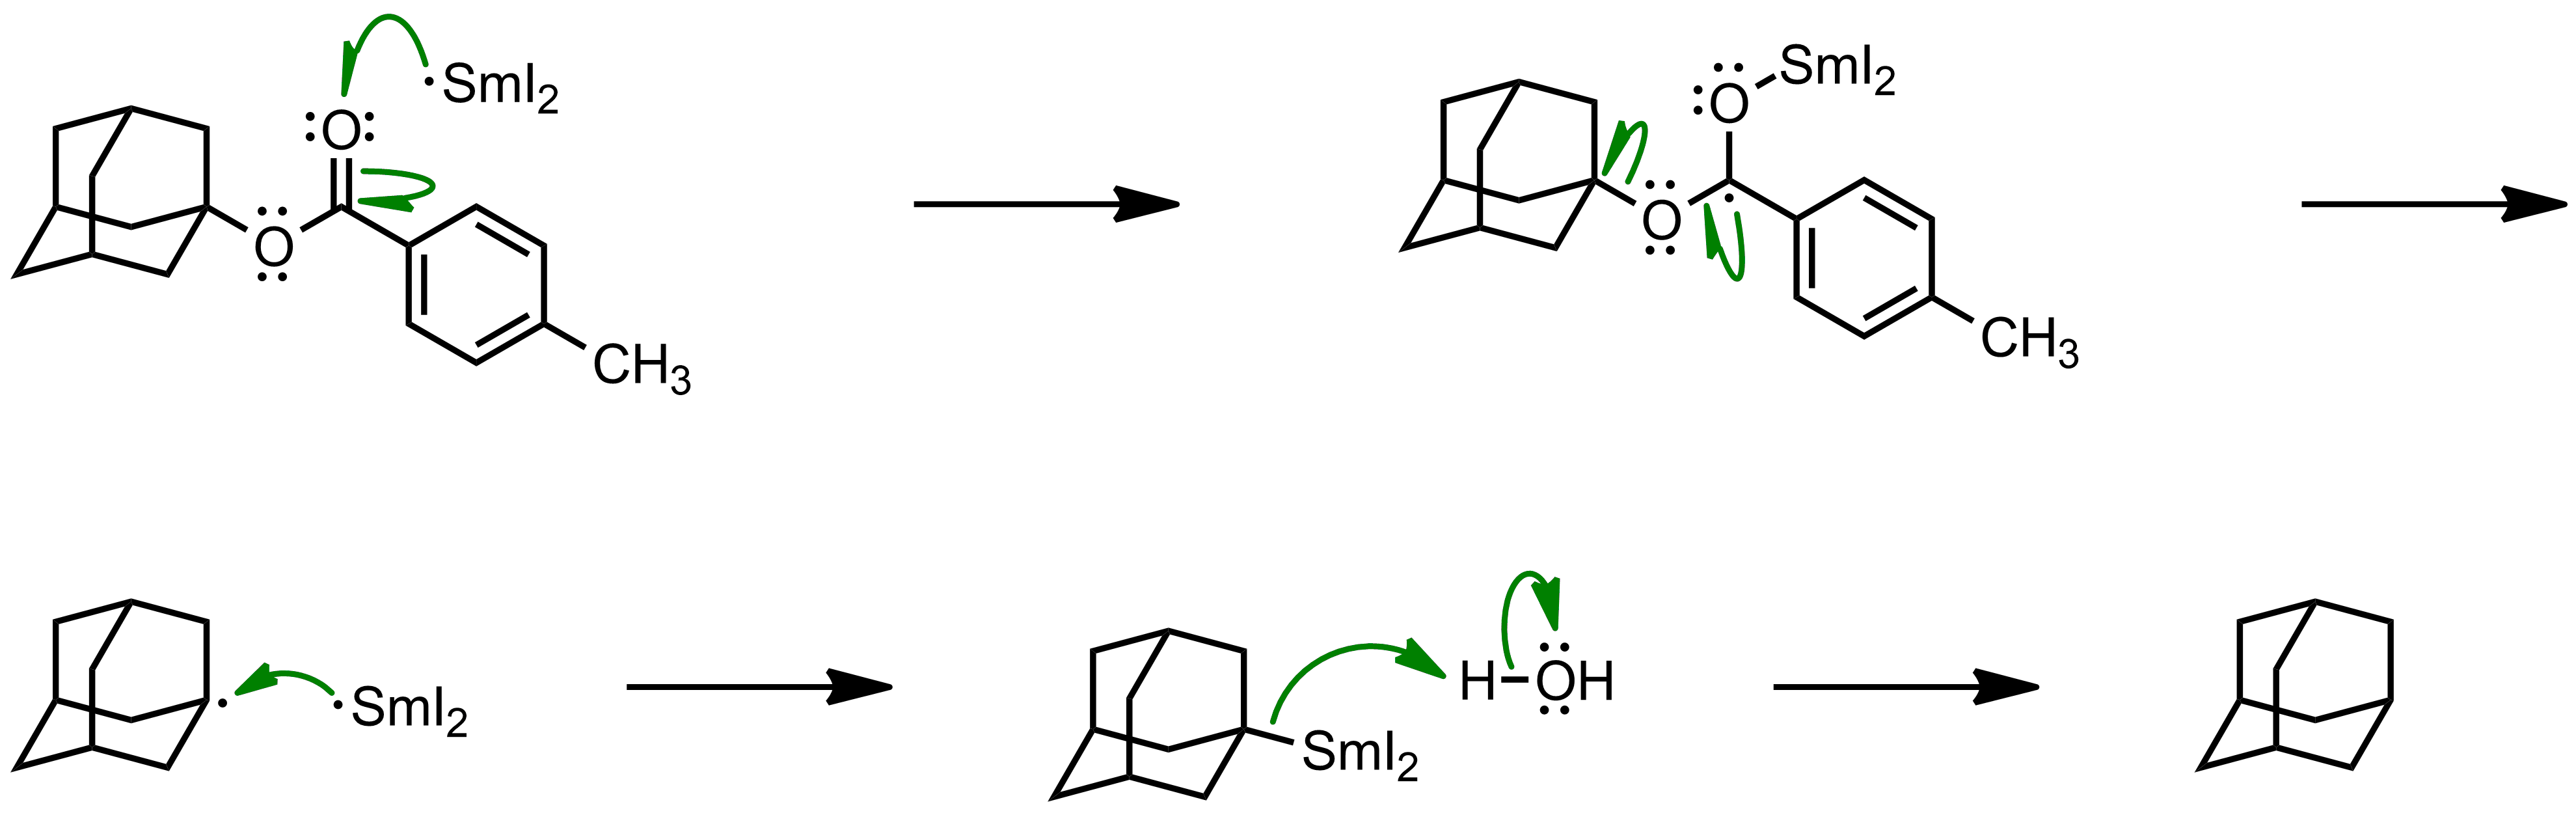 Mechanism of the Markó-Lam Deoxygenation